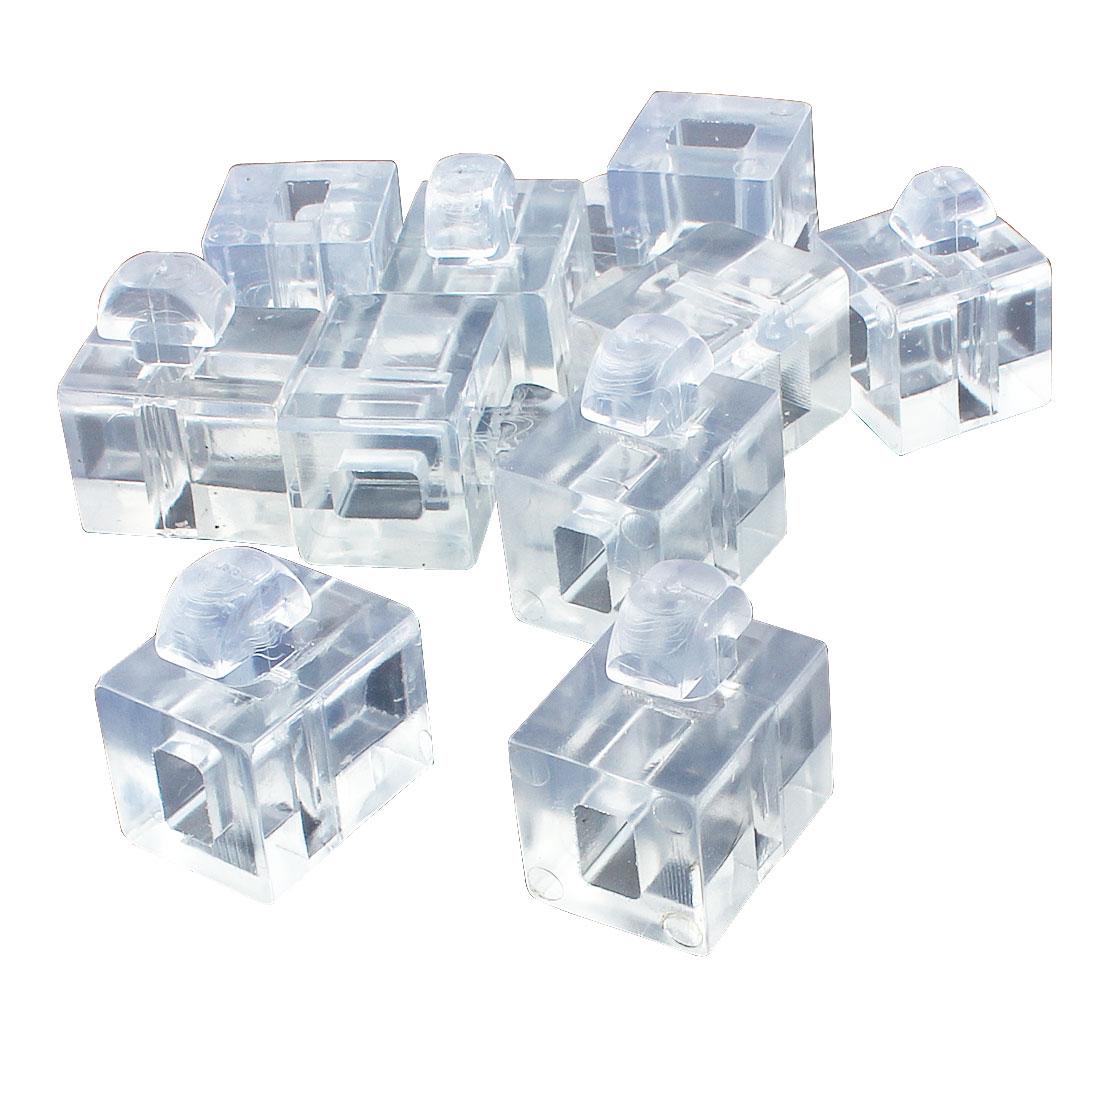 Aluminum Profile 40 Series Spacer Fastener Organic Glass Connector Block Clear 10pcs